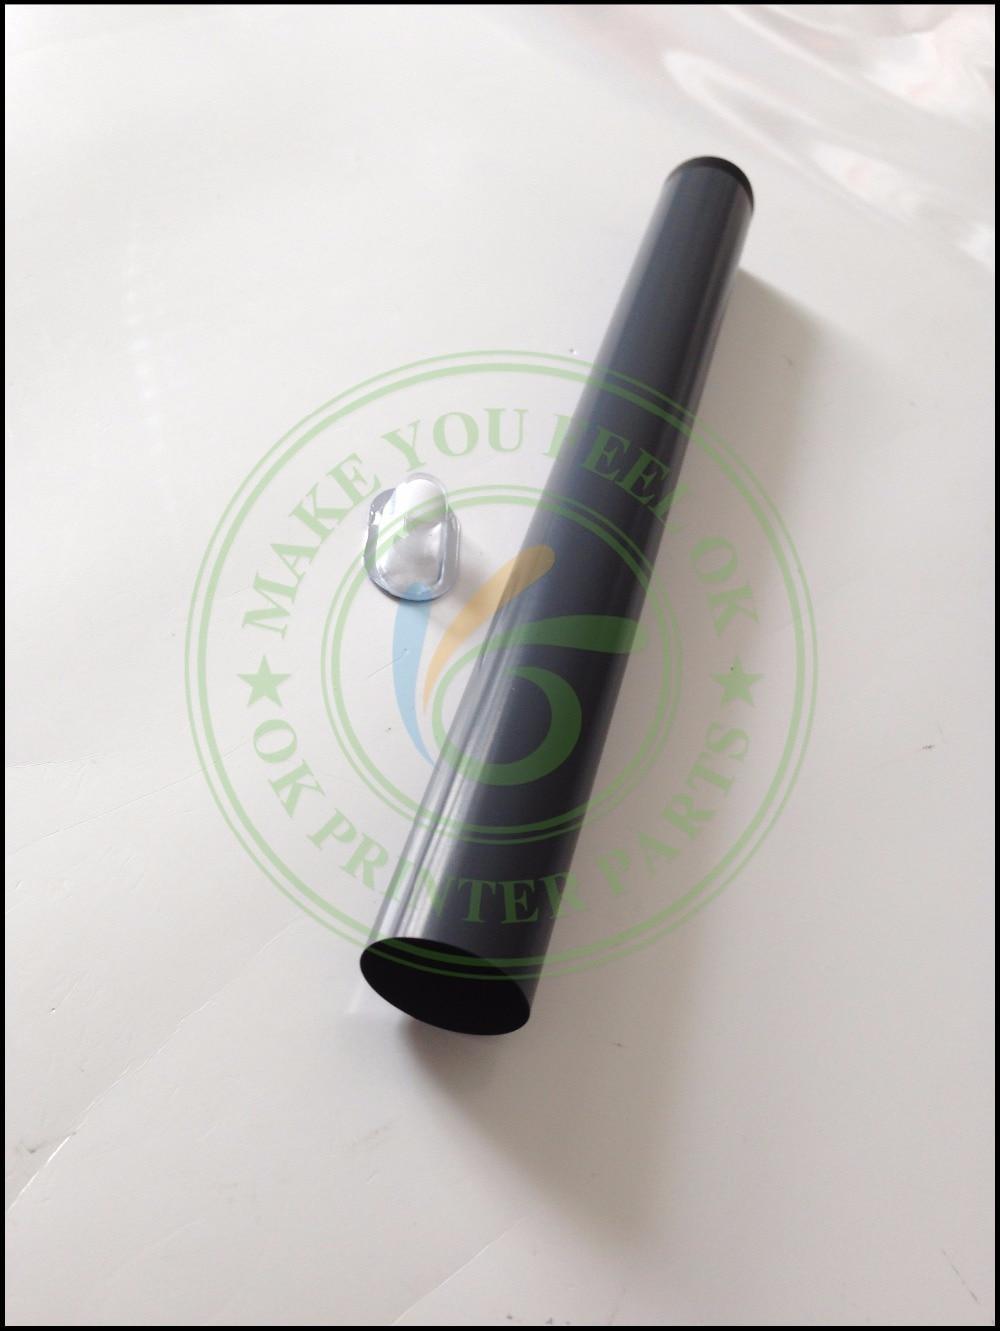 все цены на ORIGINAL NEW Fuser film sleeve Fixing Film Sleeve Teflon + grease for HP P3015 P3015d P3015dn P3015n P3015x P3010 P3011 P3016 онлайн